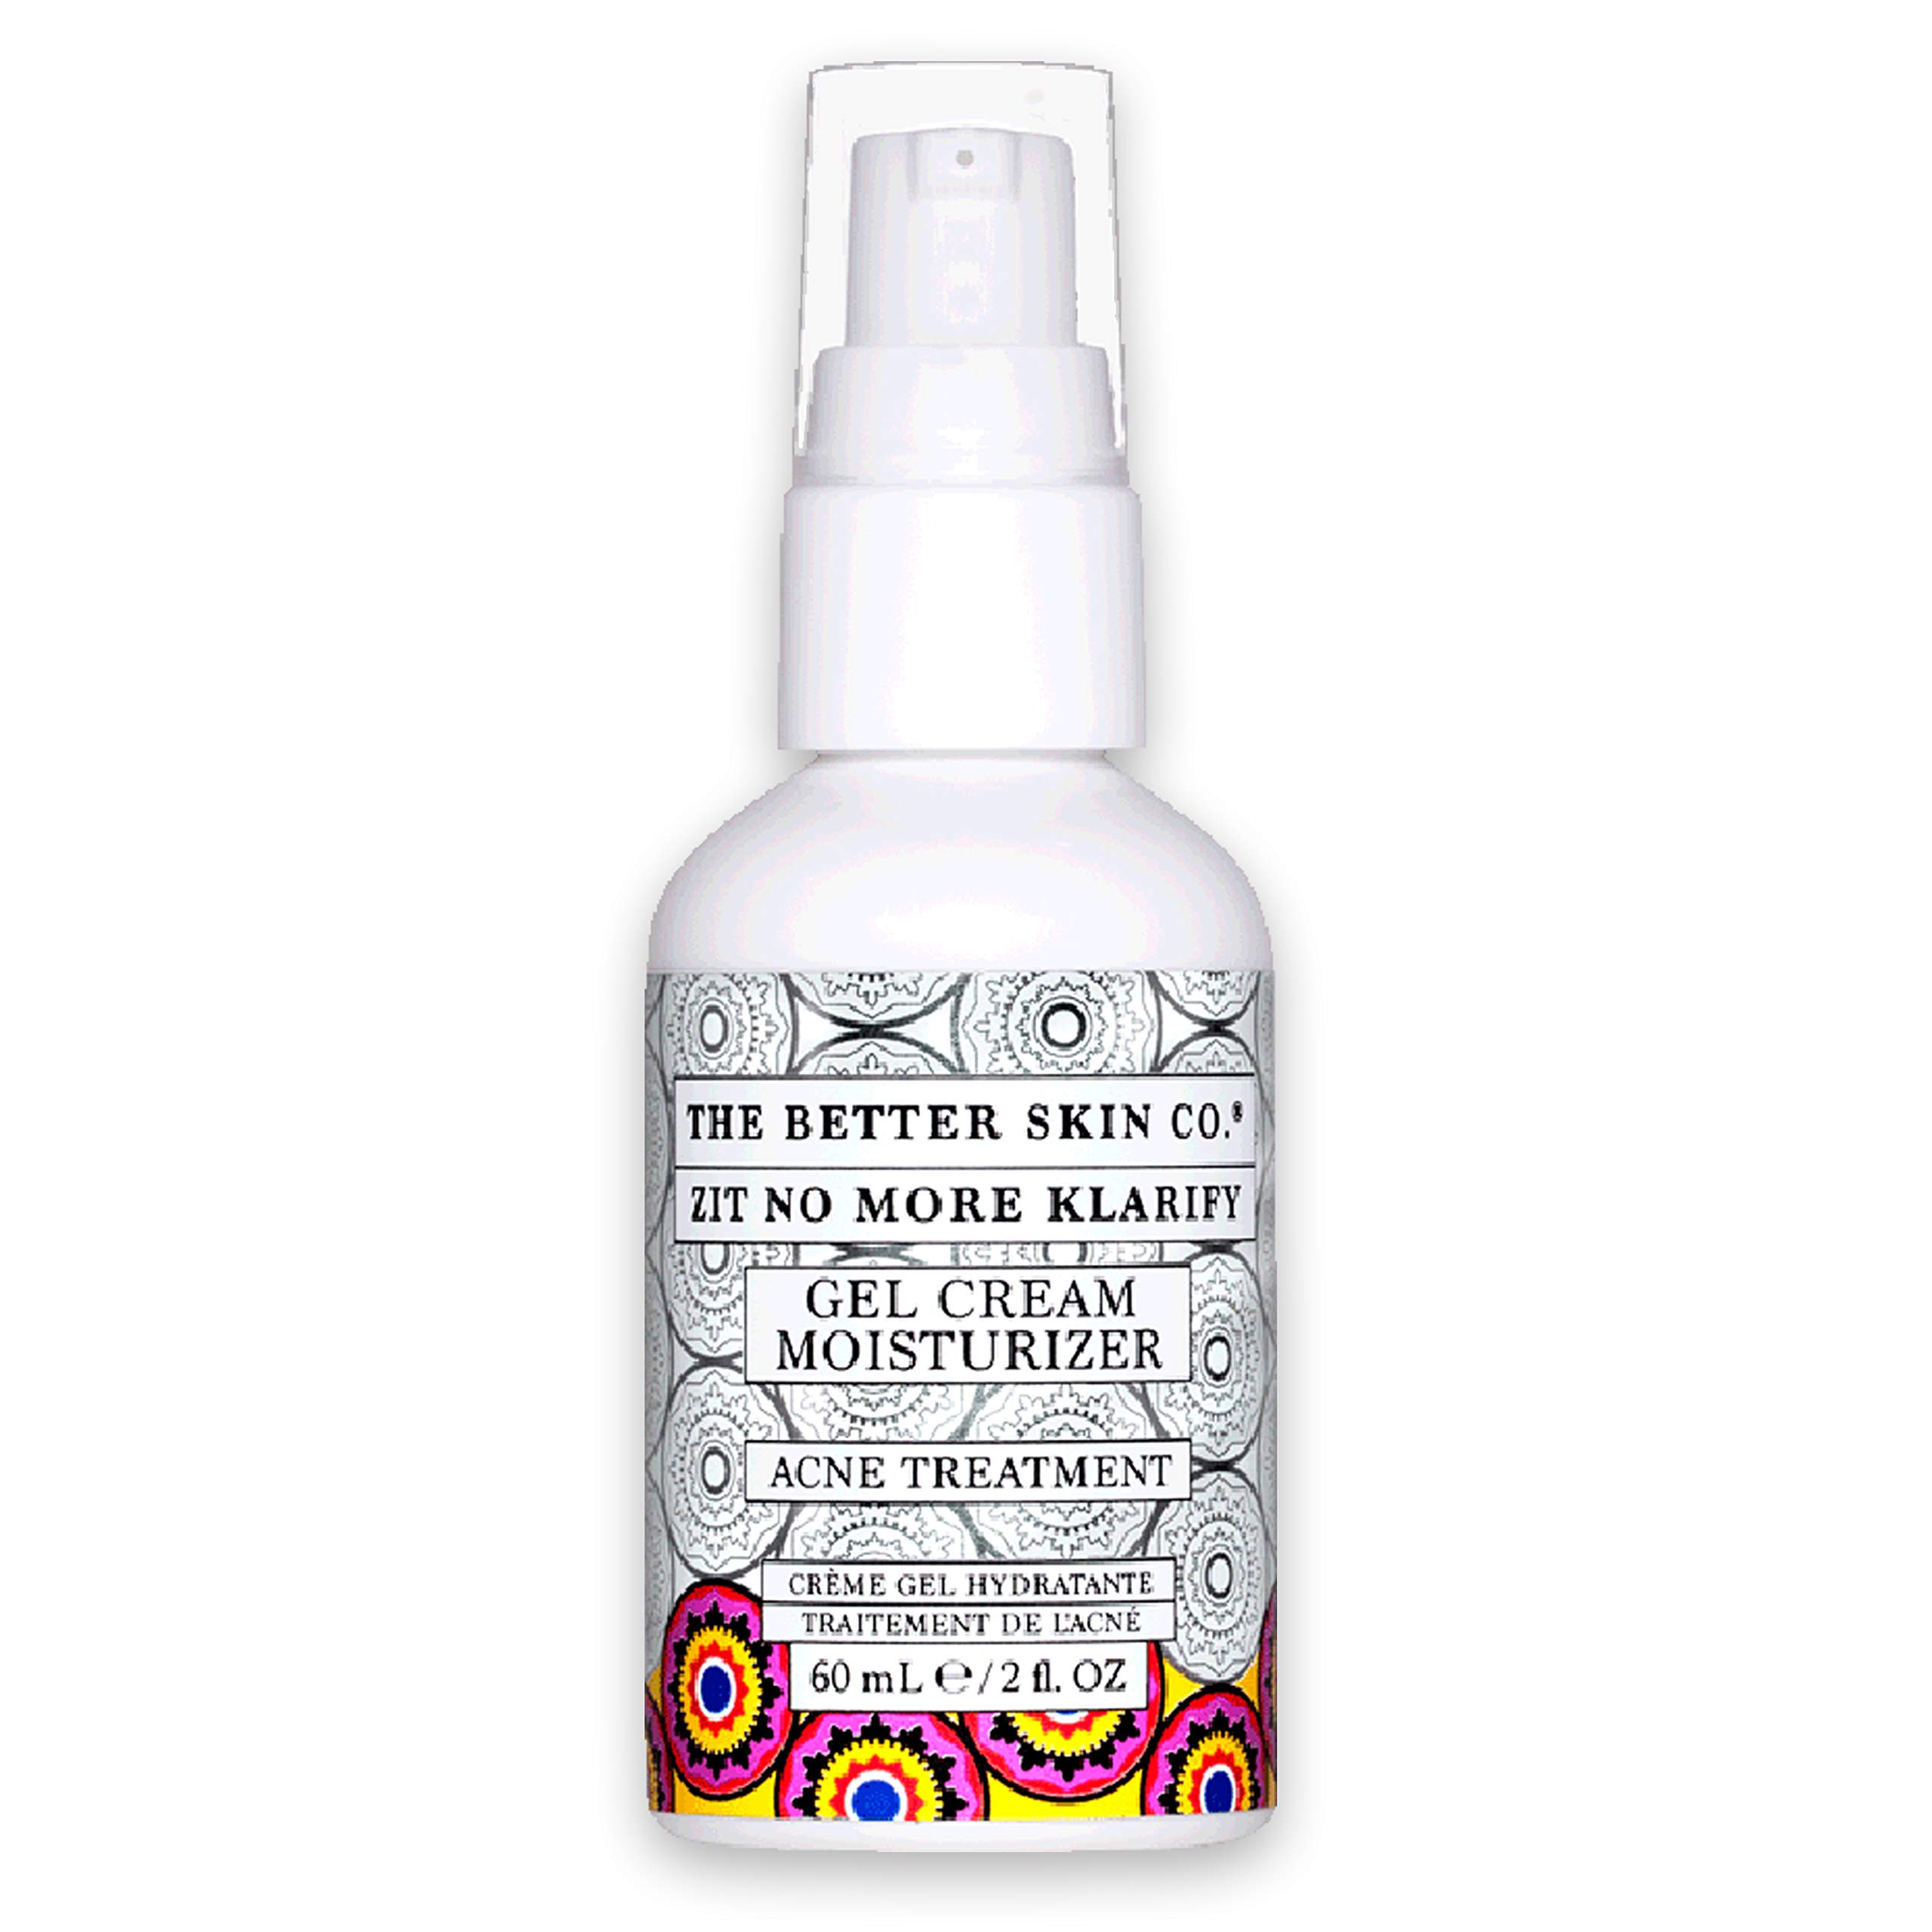 The Better Skin Co.   Klarify Facial Gel/Cream Moisturizer To Hydrate & Treat The Skin.